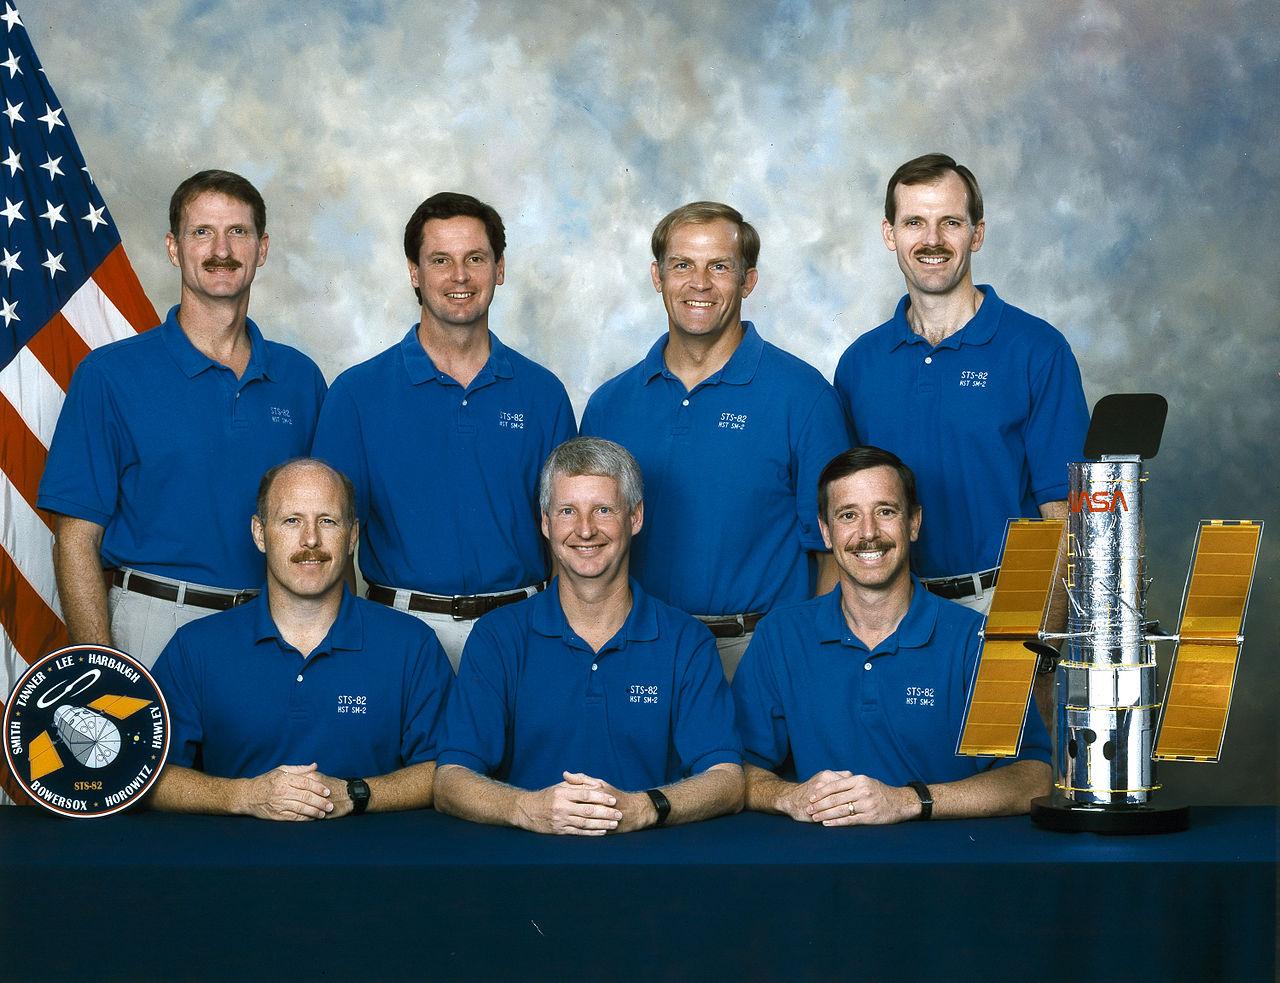 https://www.nuggetsfactory.com/EURO/militaria/espace/artifact/STS-82_crew.jpg